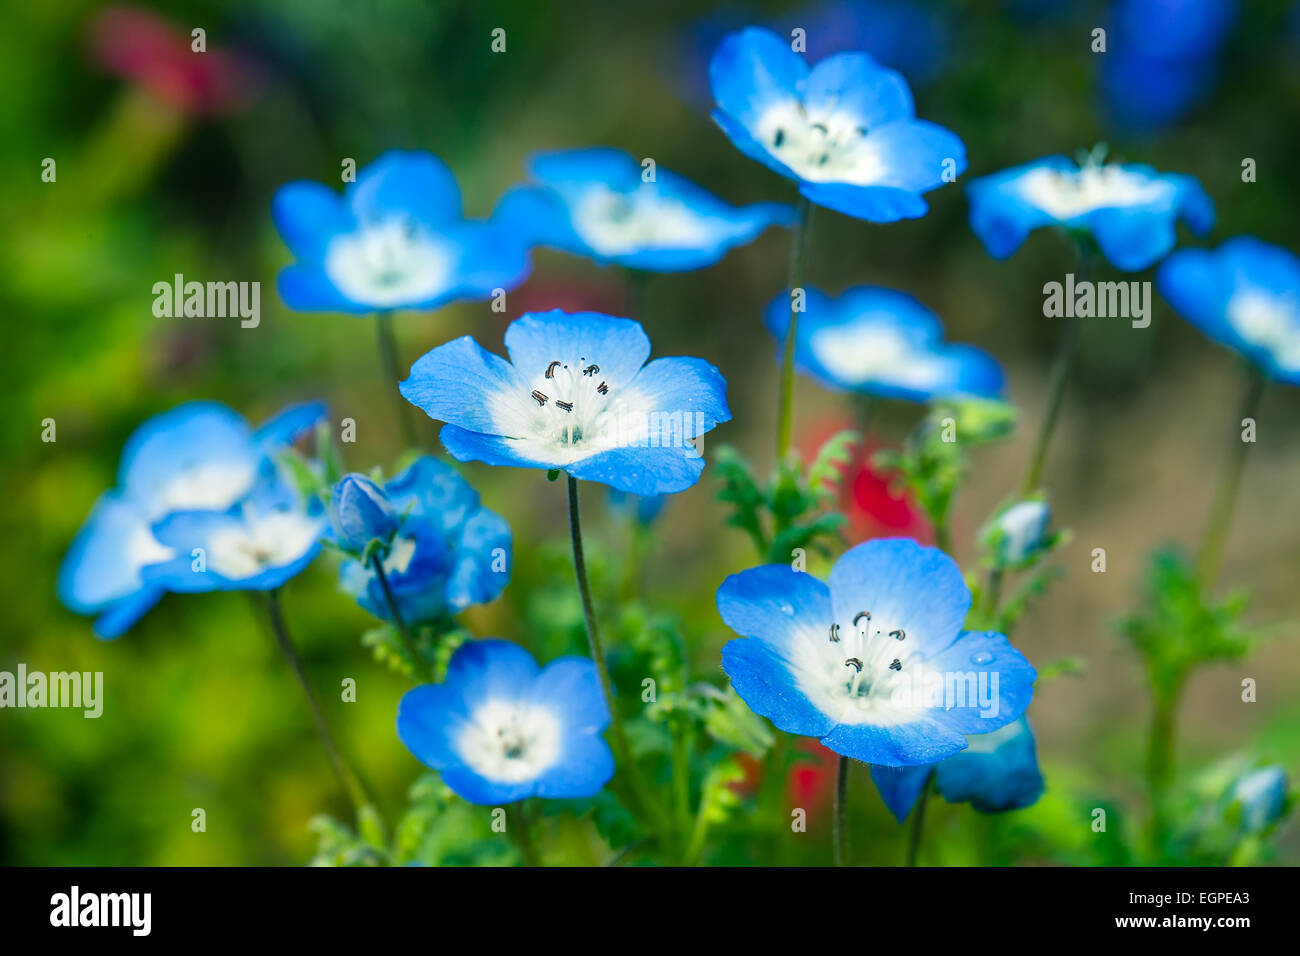 Nemophila Stock Photos & Nemophila Stock Images - Alamy